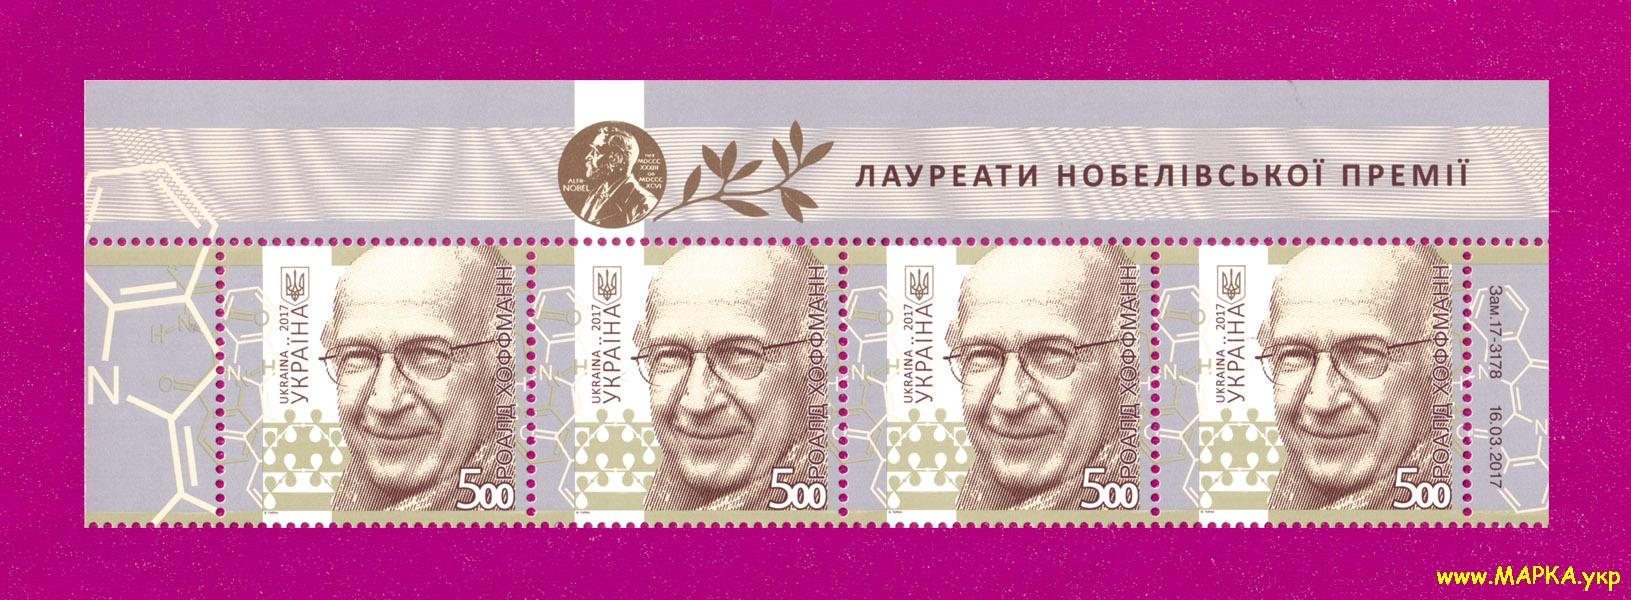 2017 верх листа Роалд Хоффман химик Украина